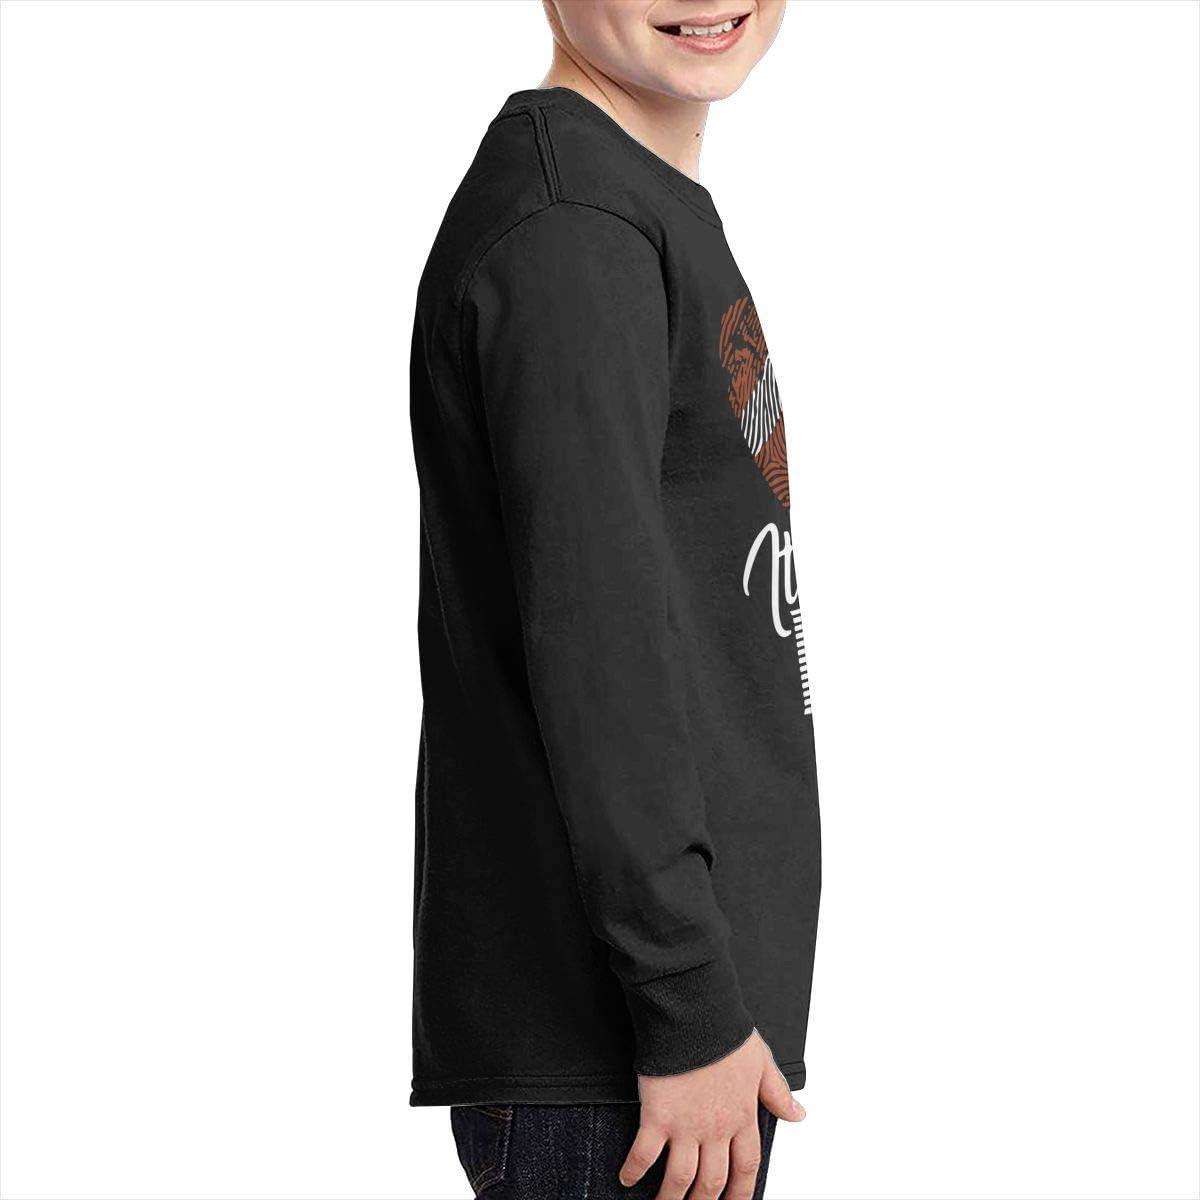 Teenagers Teen Boy American Football Its in My DNA Printed Long Sleeve 100/% Cotton Tee Shirt